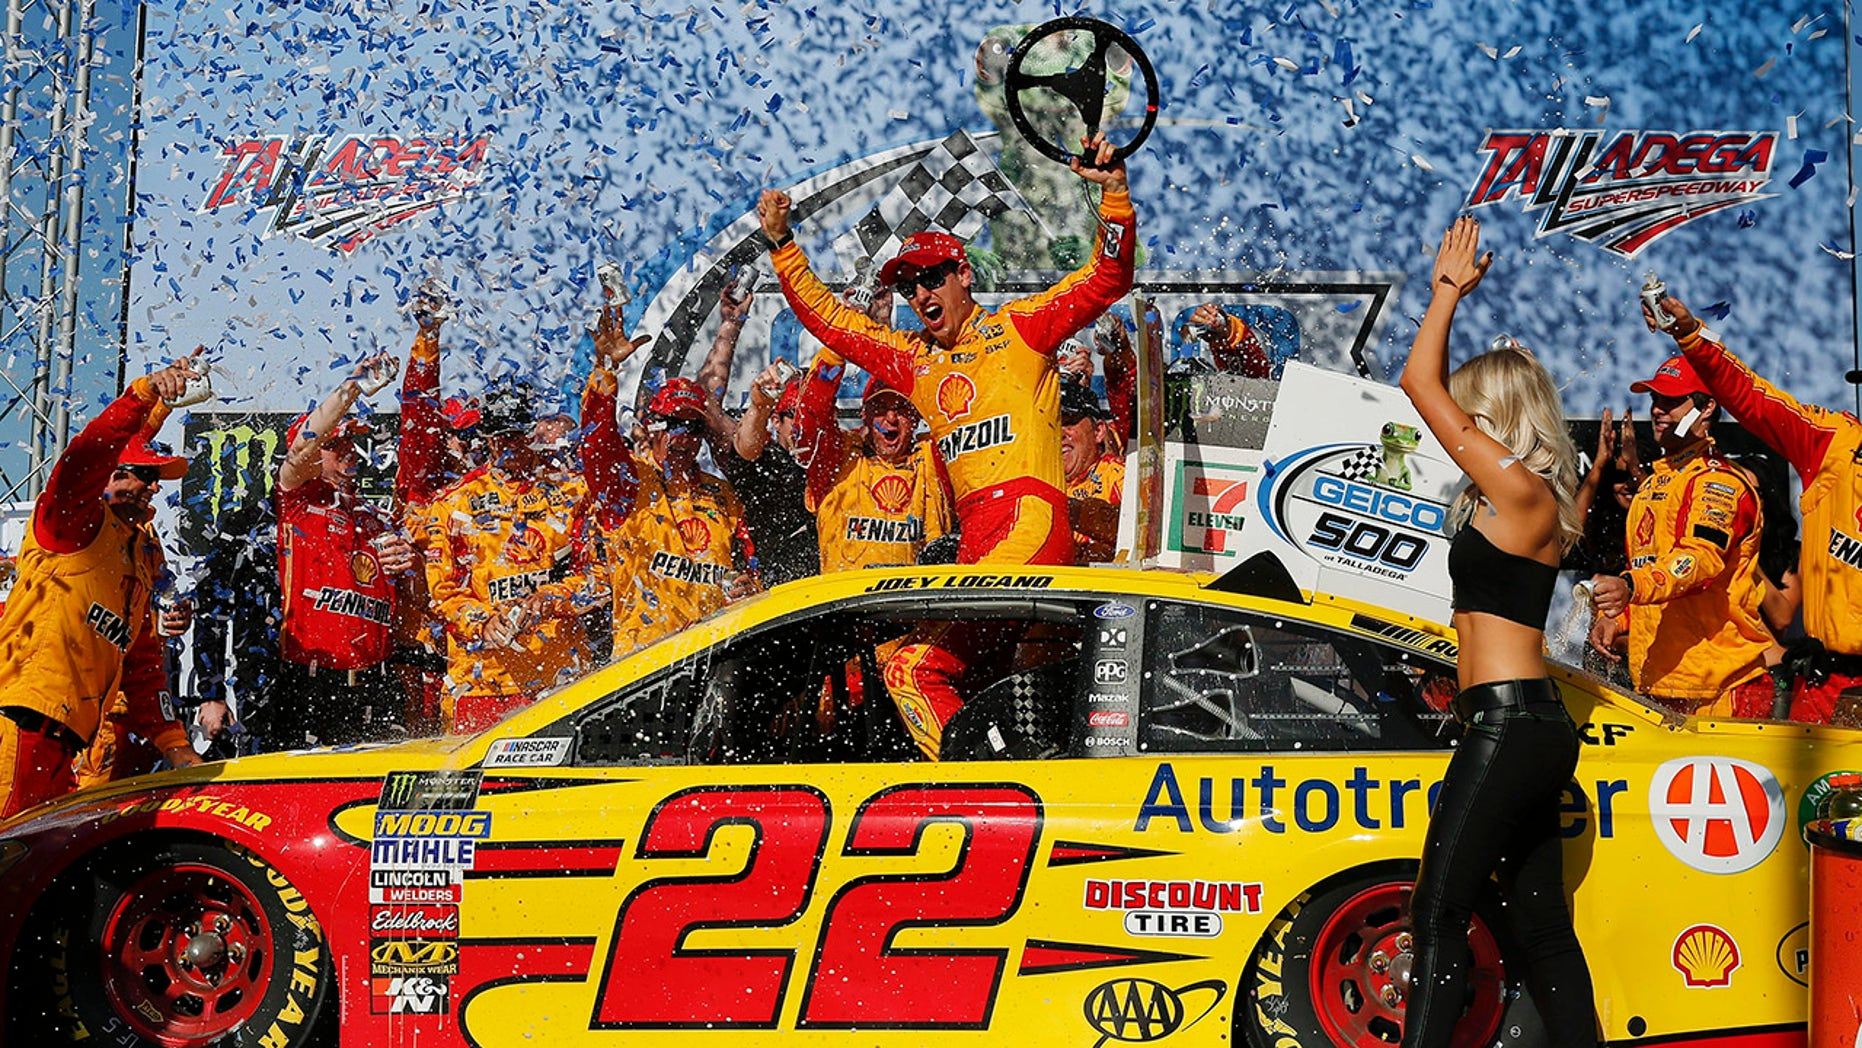 NASCAR driver Joey Logano celebrates in victory lane after winning the NASCAR Talladega auto race at Talladega Superspeedway, Sunday, April 29, 2018, in Talladega, Ala. (AP Photo/Brynn Anderson)